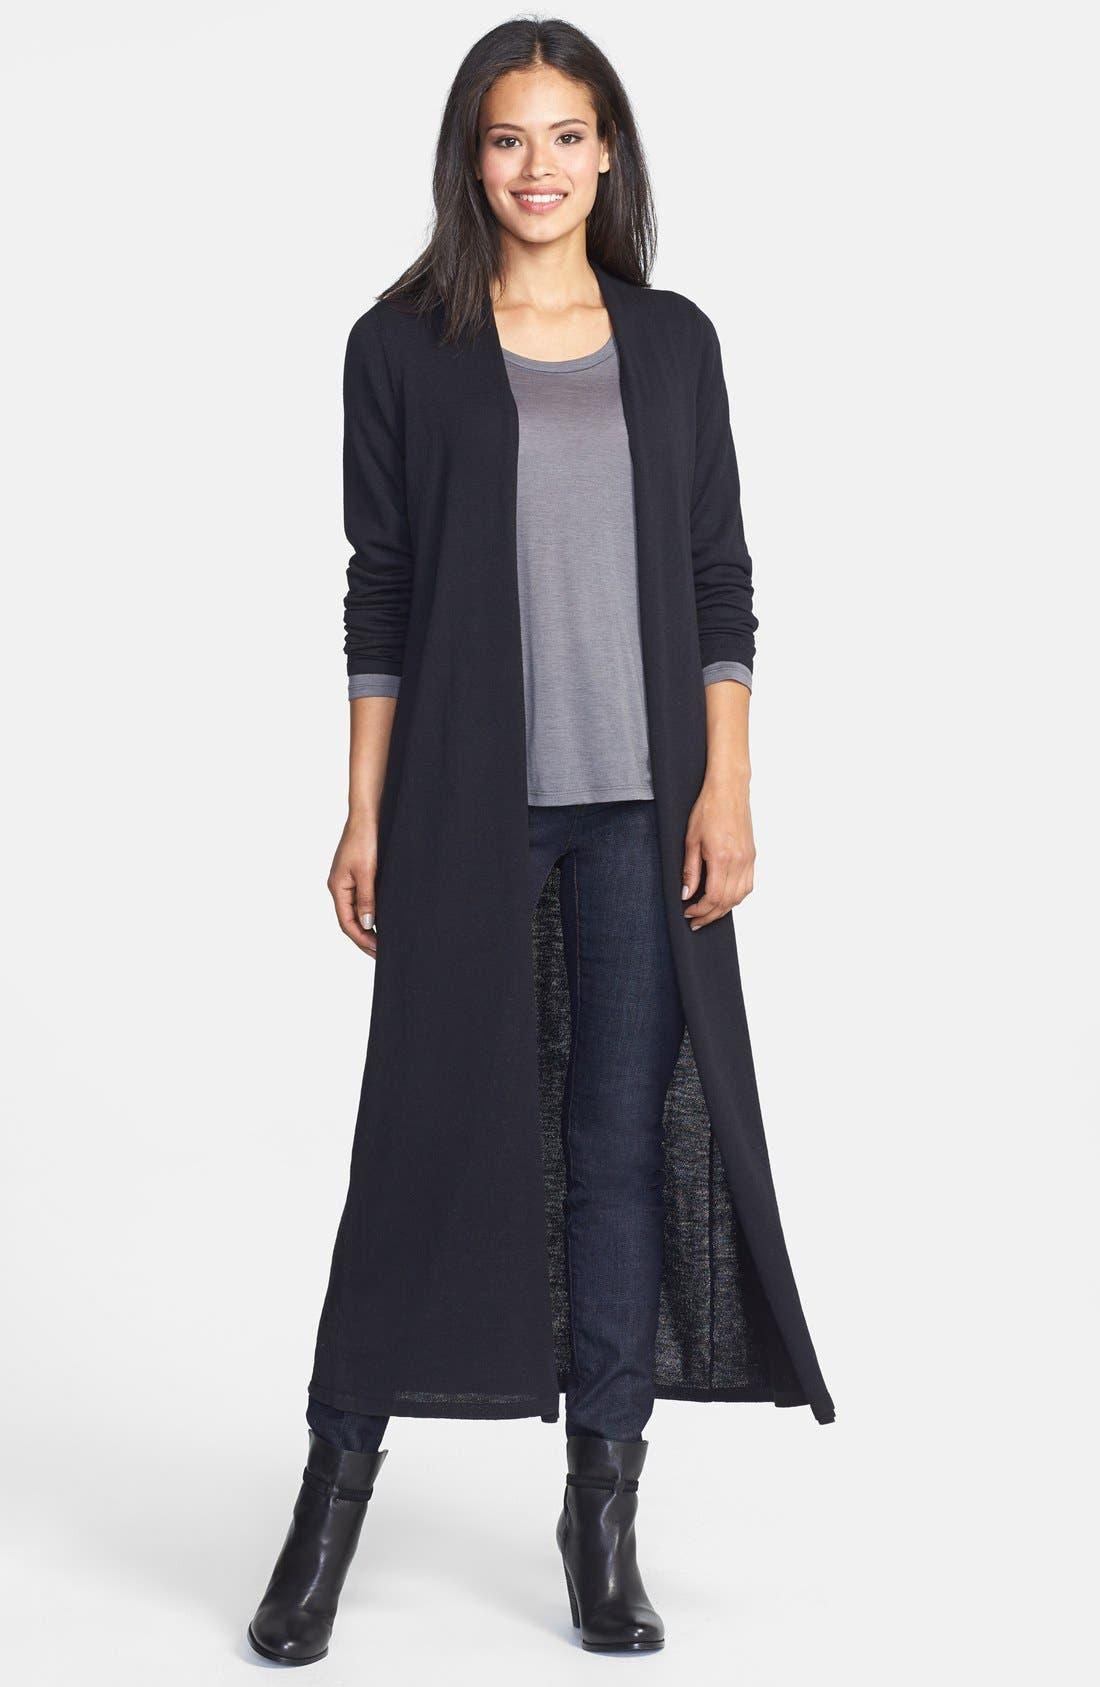 Alternate Image 1 Selected - Eileen Fisher Long Wool Jersey Cardigan (Regular & Petite)